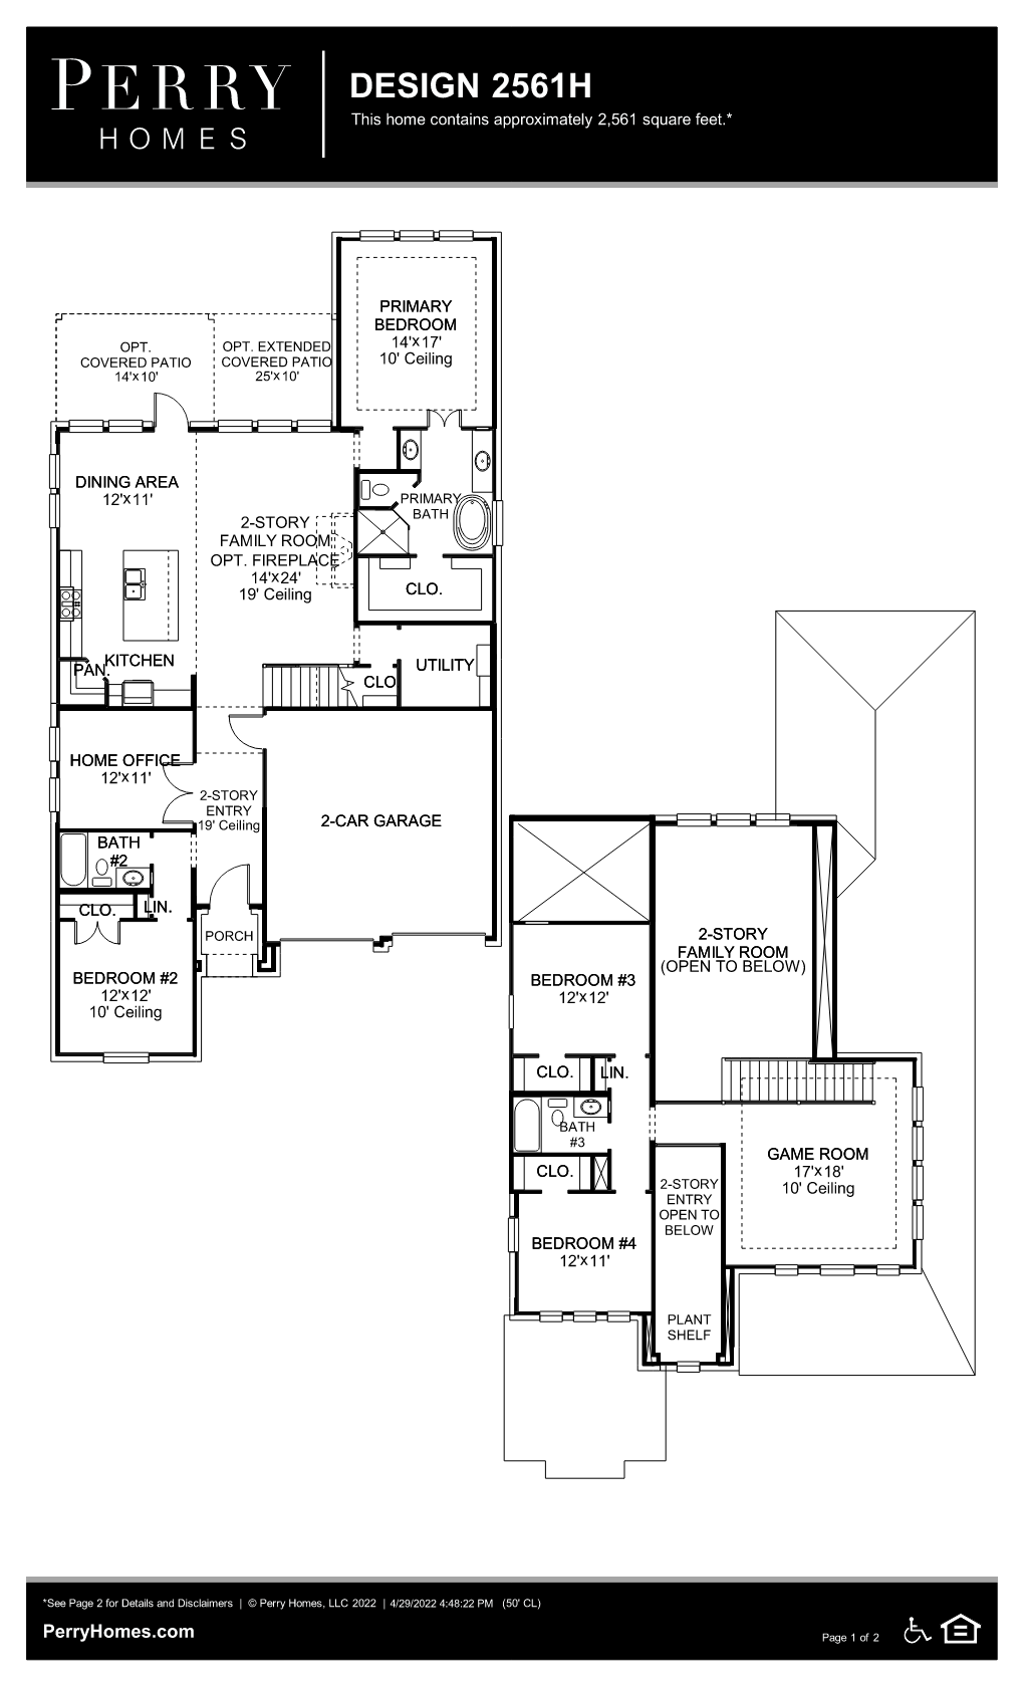 Floor Plan for 2561H